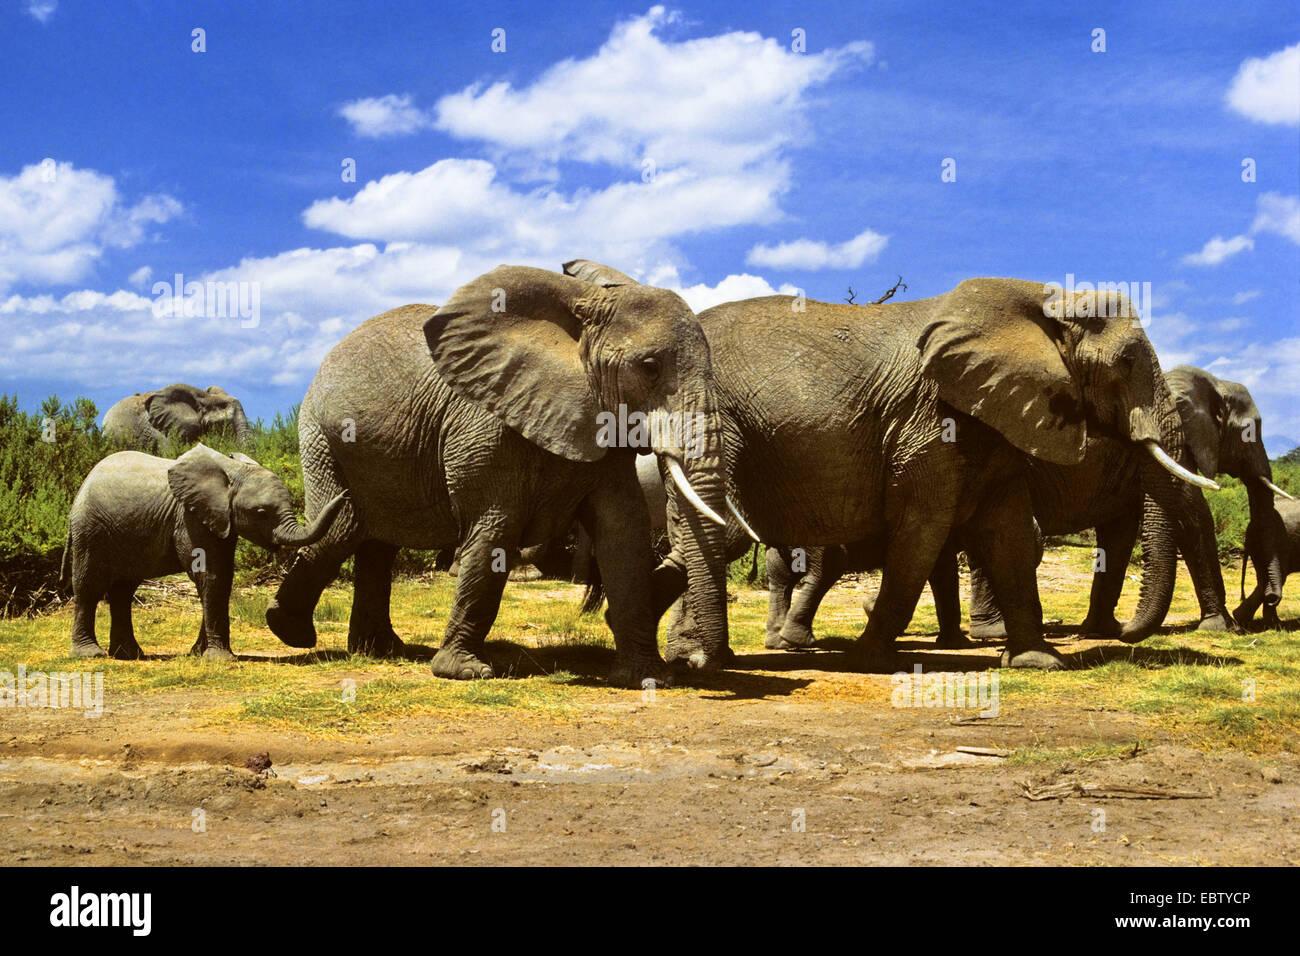 African elephant (Loxodonta africana), herd of elephants, Kenya, Amboseli National Park - Stock Image